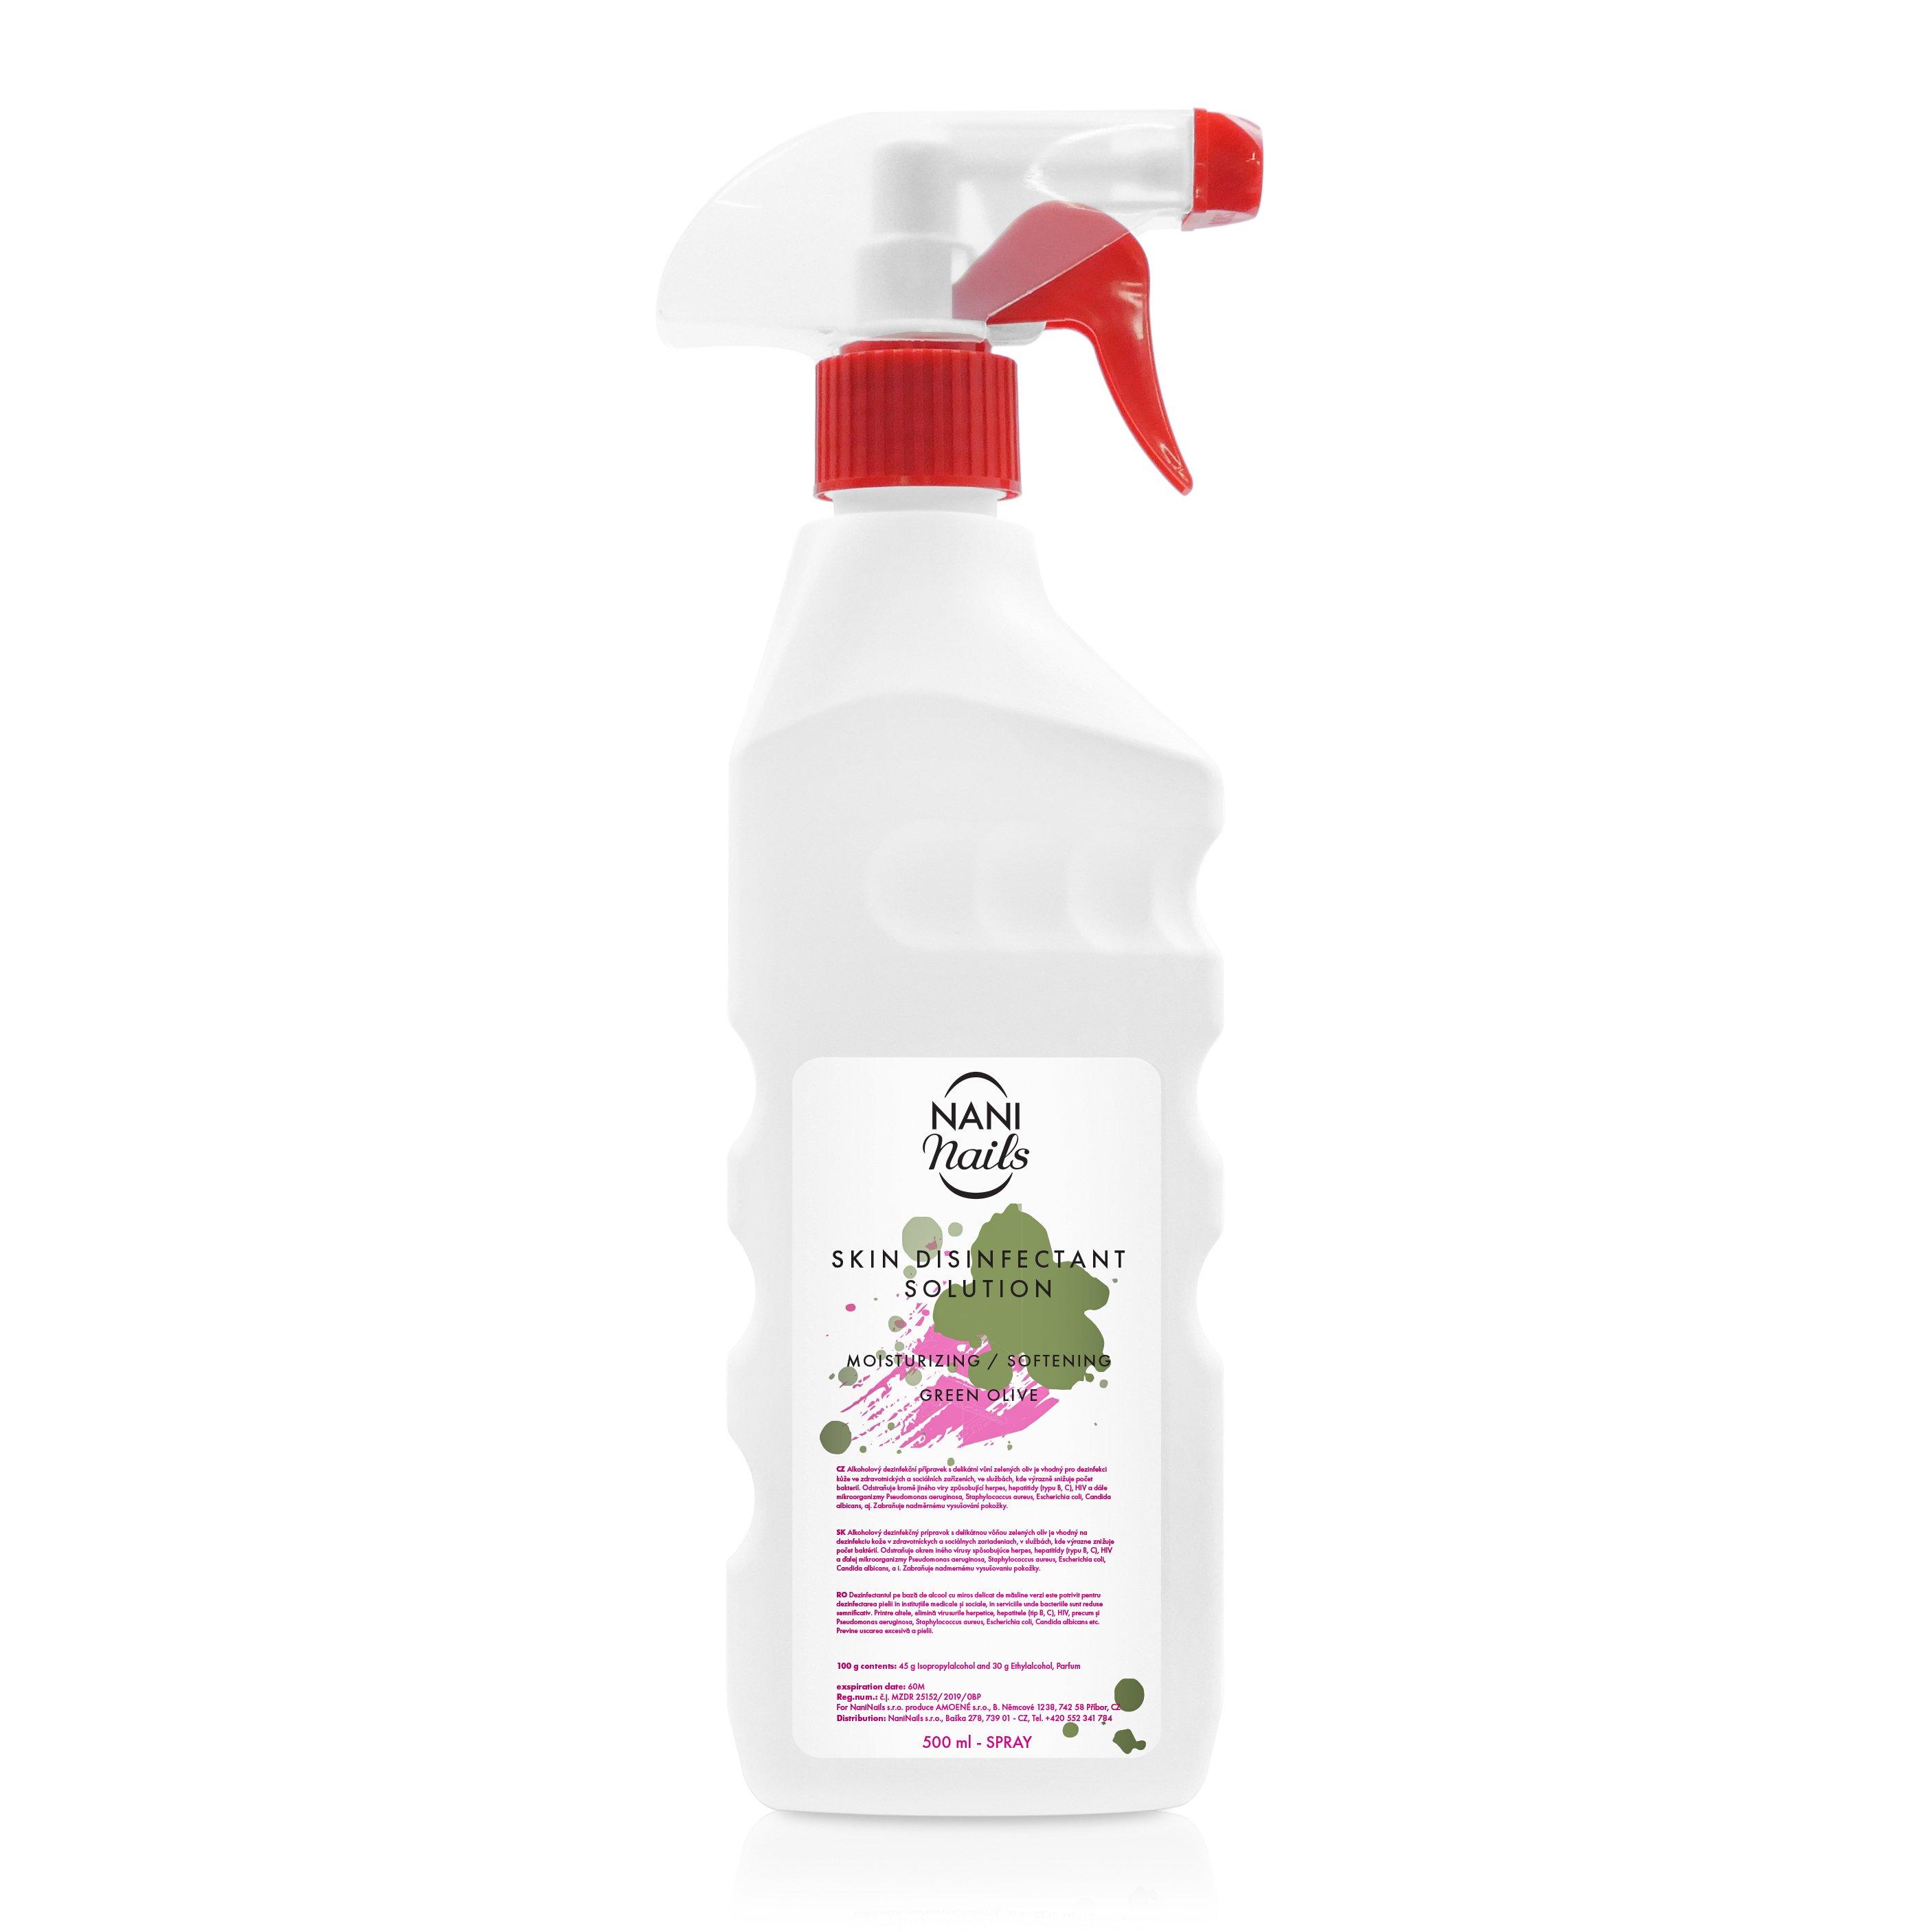 NANI Lavosept dezinfekce na ruce 500 ml - Green Olive